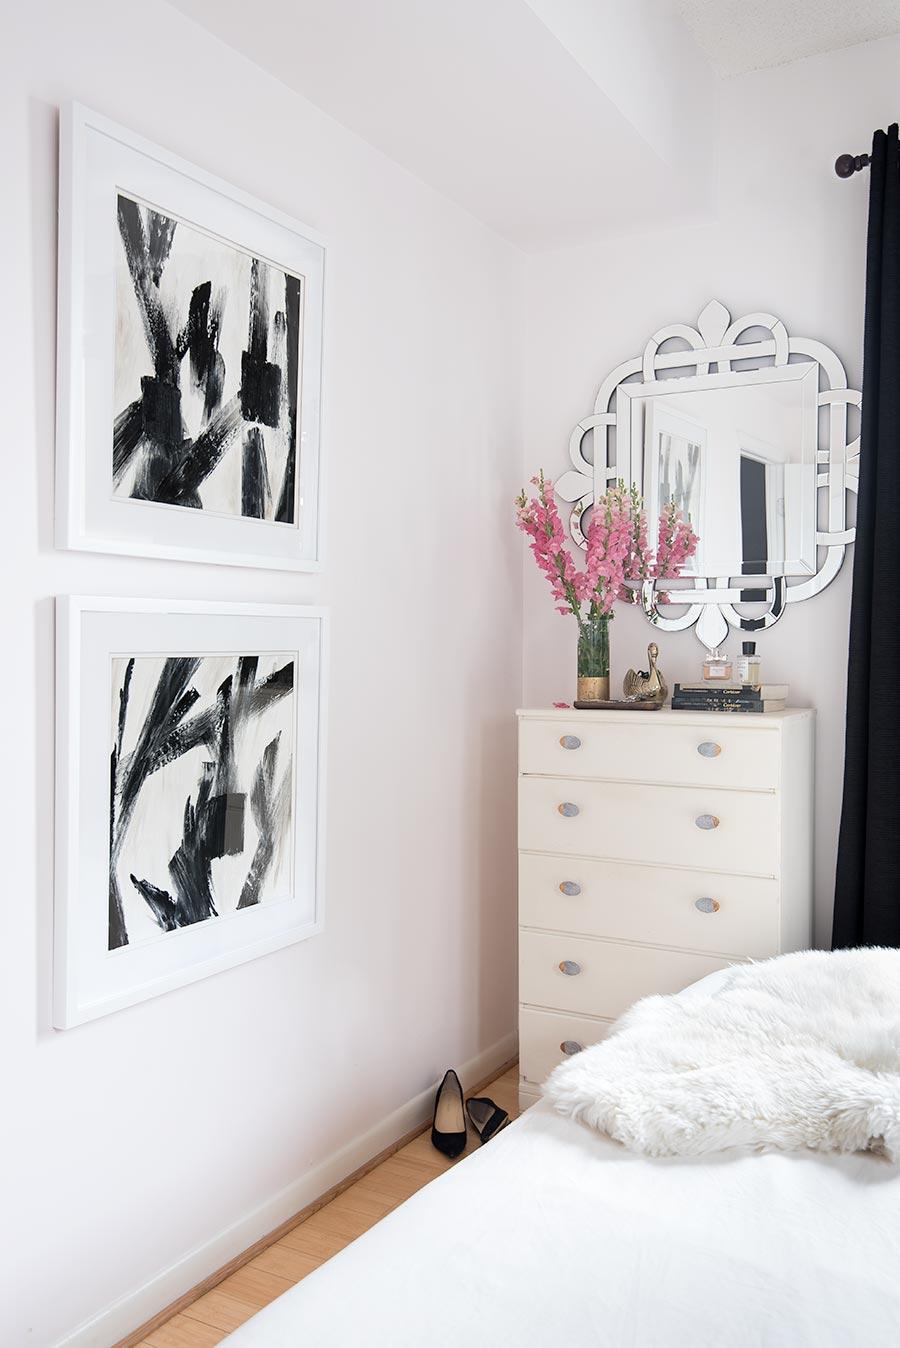 mariella-cruzado-splendor-styling-master-bedroom-decorator-dc-designer-stylist